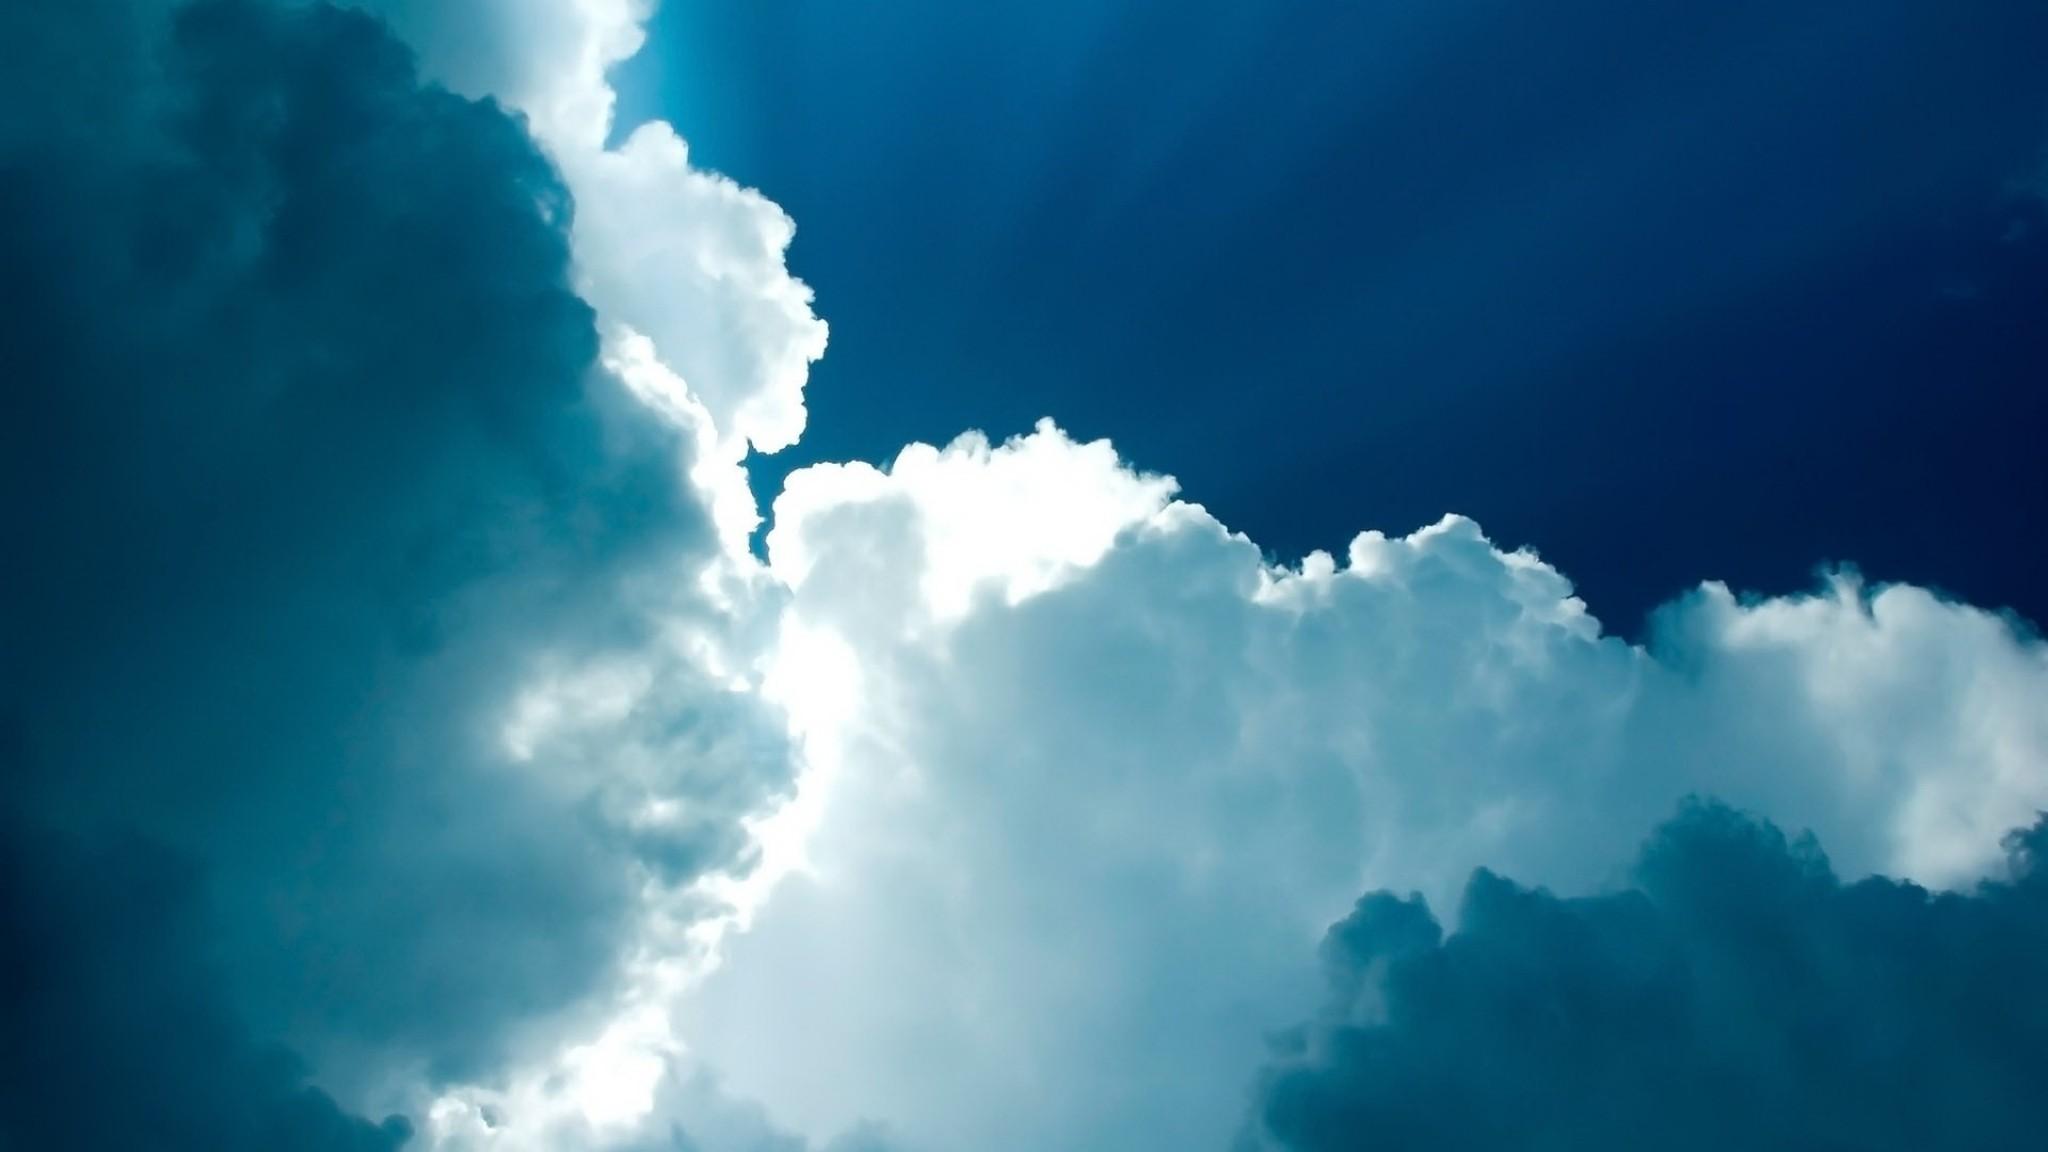 Wallpaper sky, blue, clouds, light, beams, from below